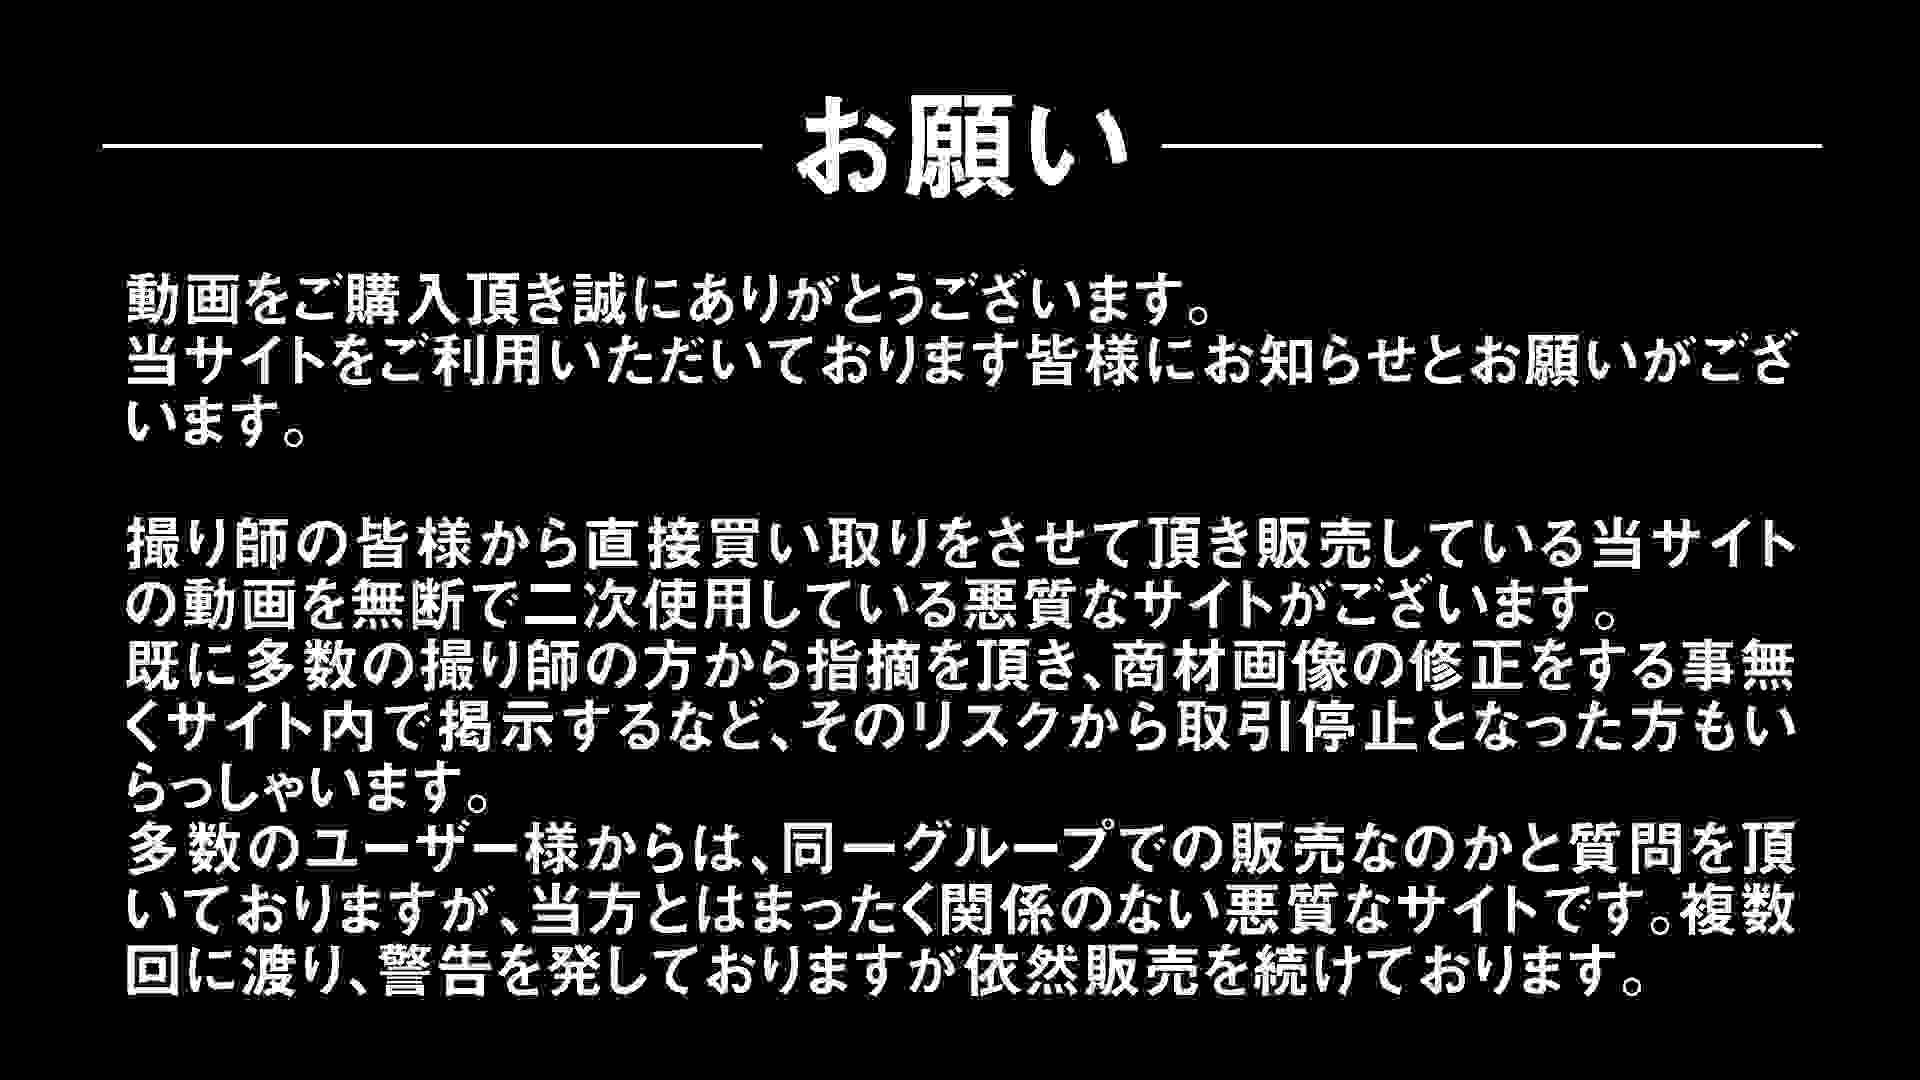 Aquaな露天風呂Vol.302 露天風呂突入 ヌード画像 82pic 2